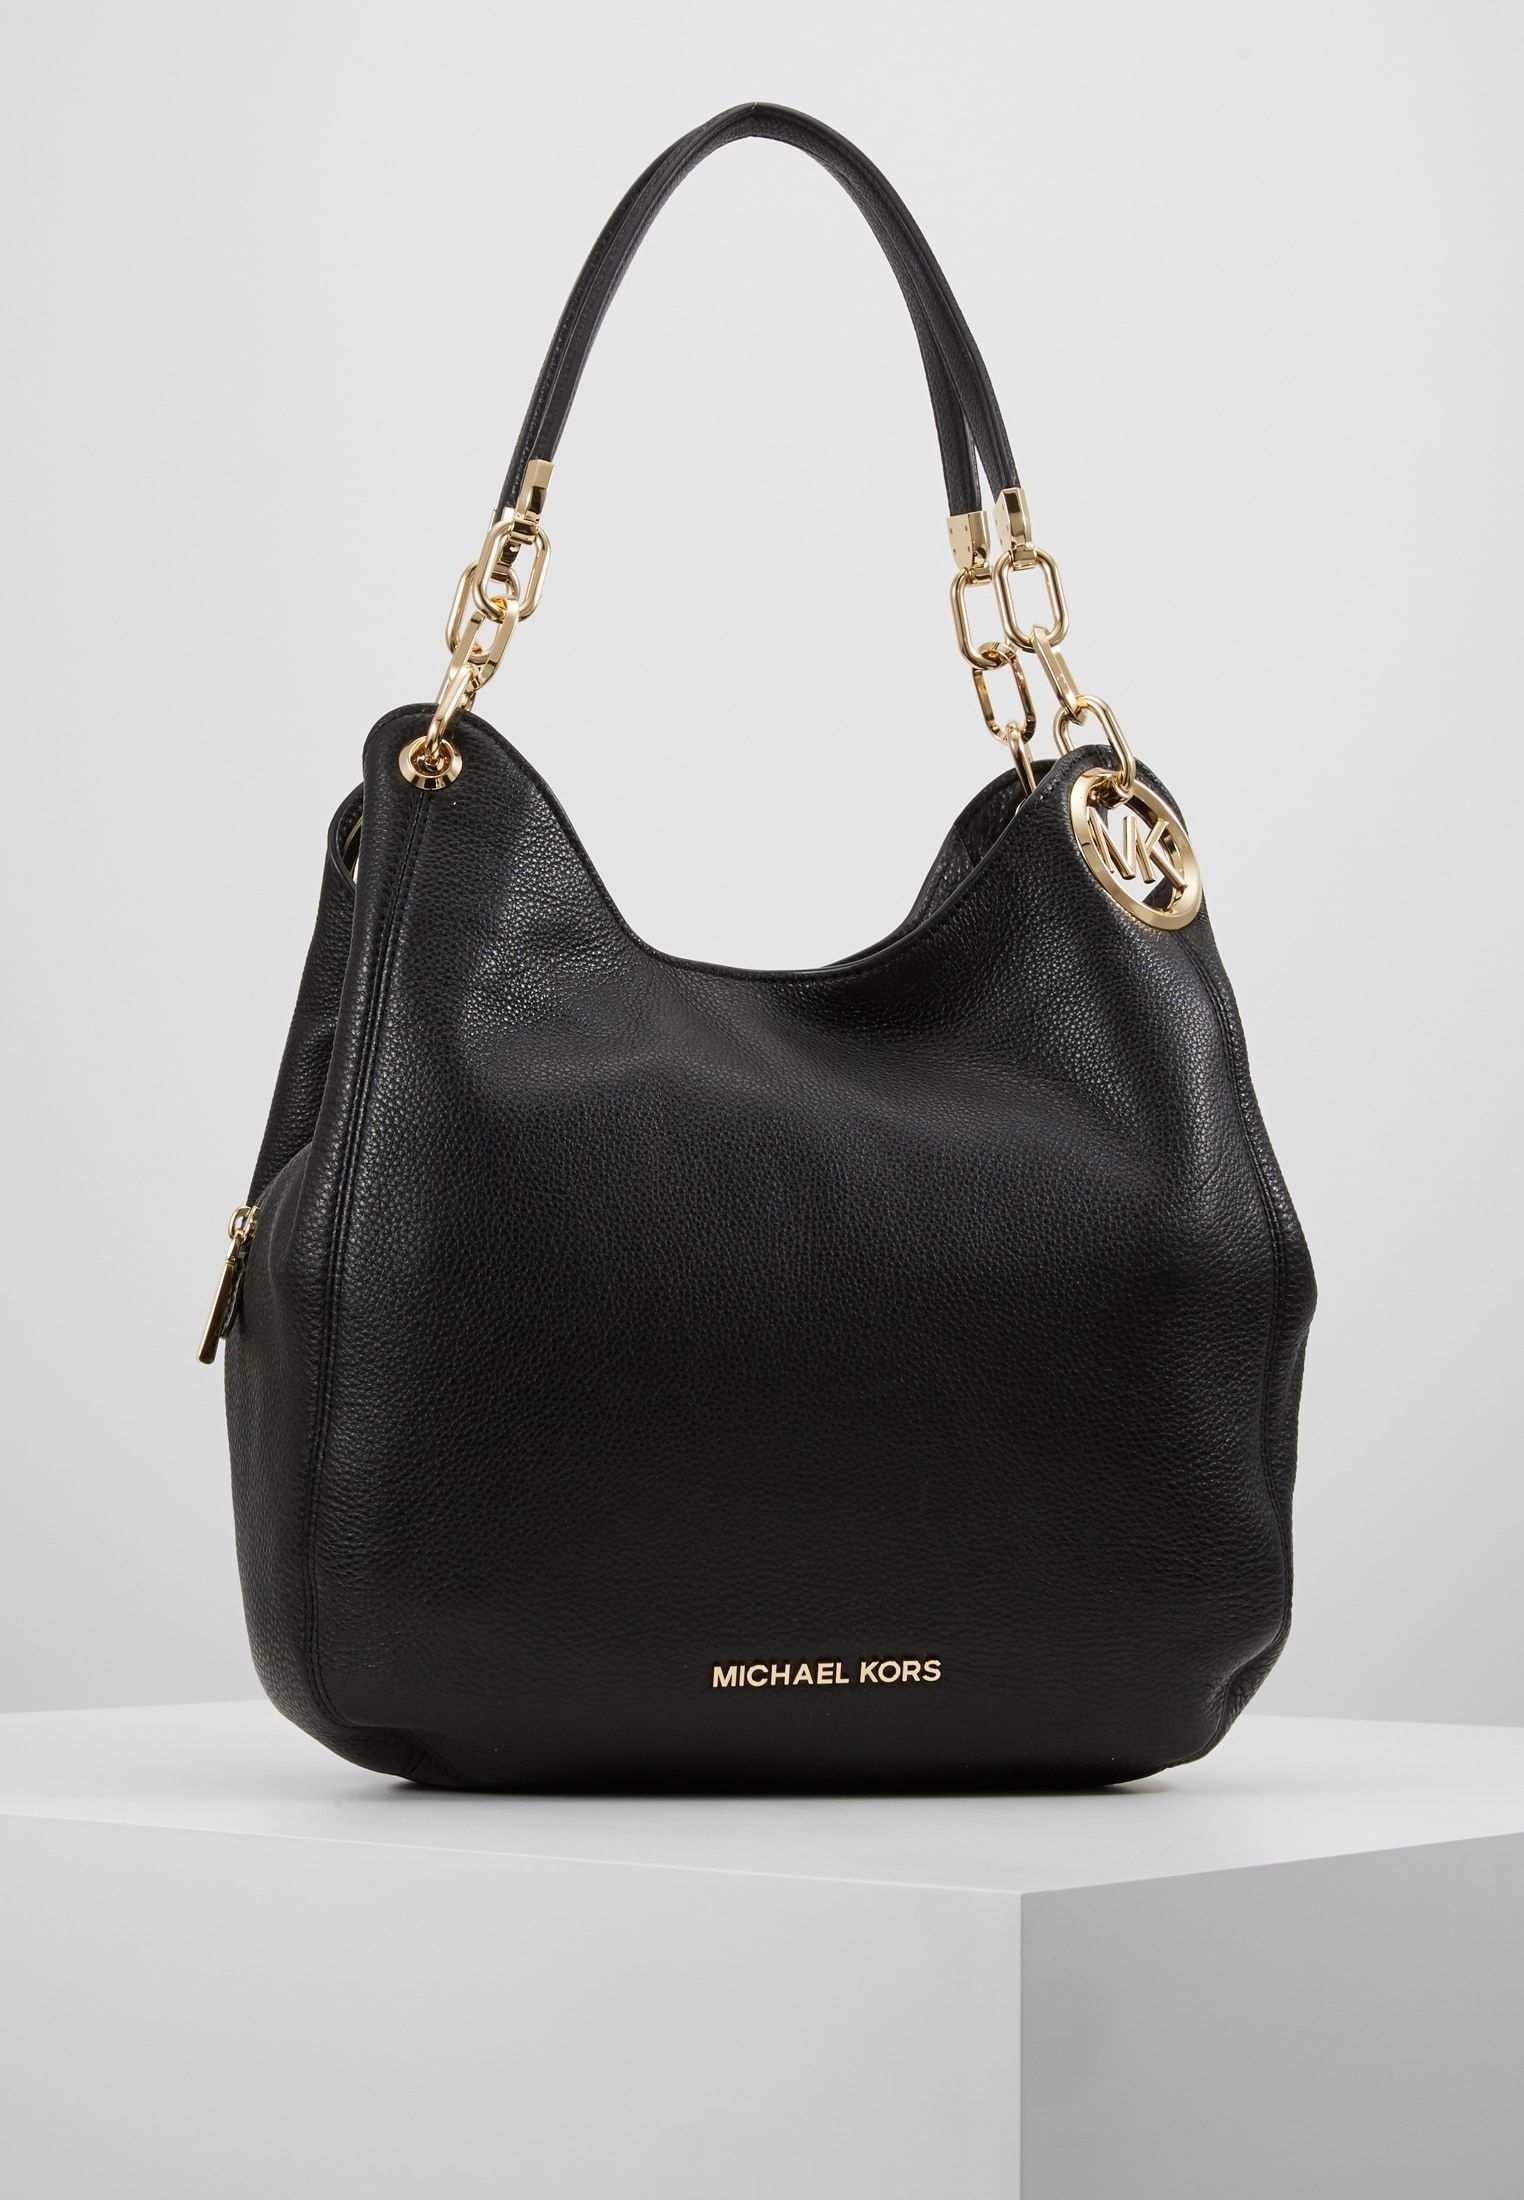 Michael Michael Kors Lillie Chain Tote Small Handtasche Black Zalando De Handtaschen Taschen Michael Kors